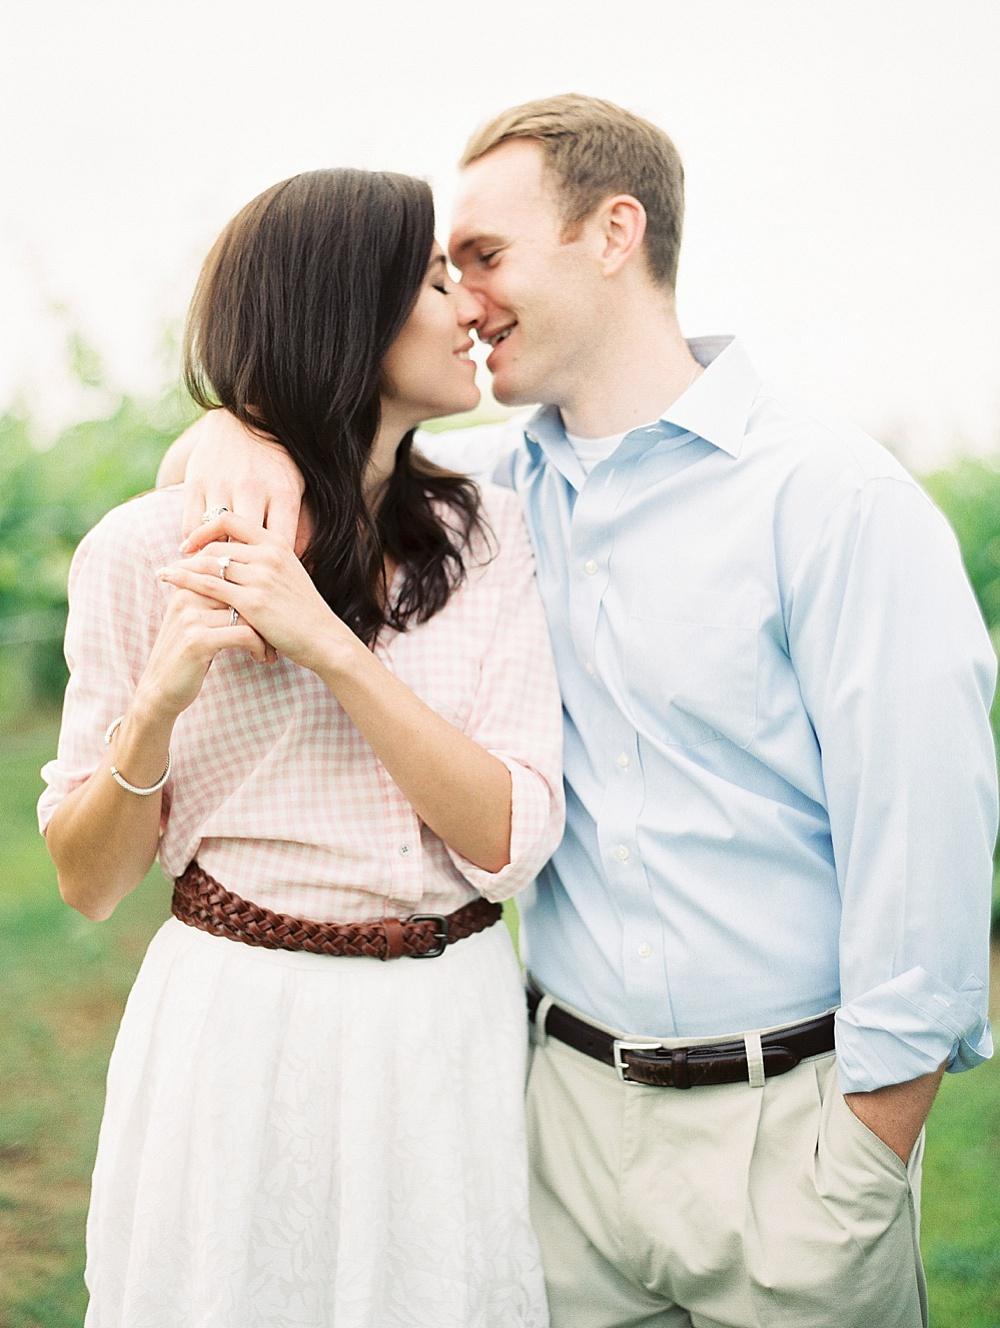 annapolis-maryland-engagement-wedding-photographer-portrait-film-photo011c.jpg